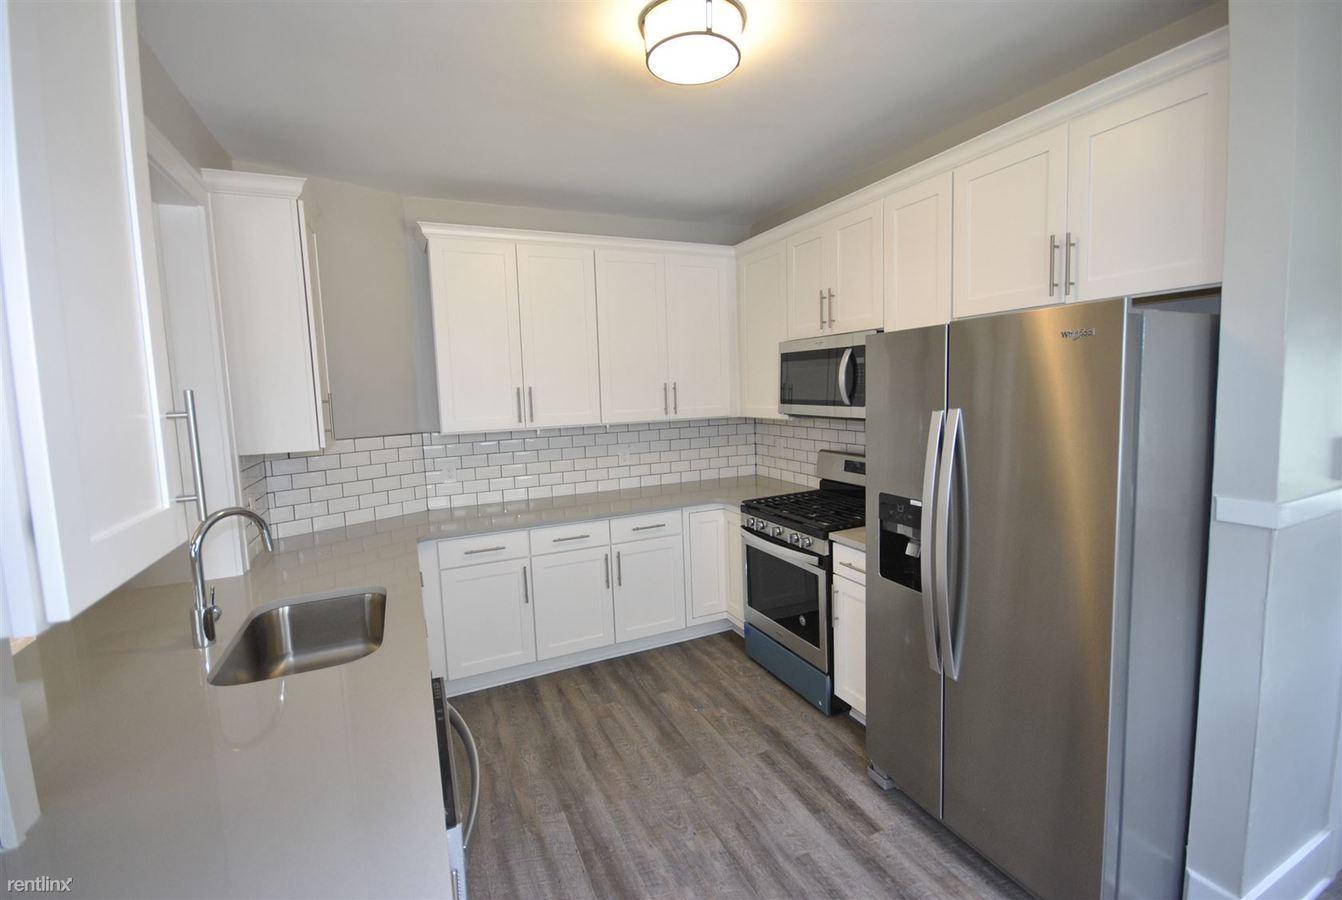 5 Bedrooms 2 Bathrooms Apartment for rent at 800 S Main St in Ann Arbor, MI